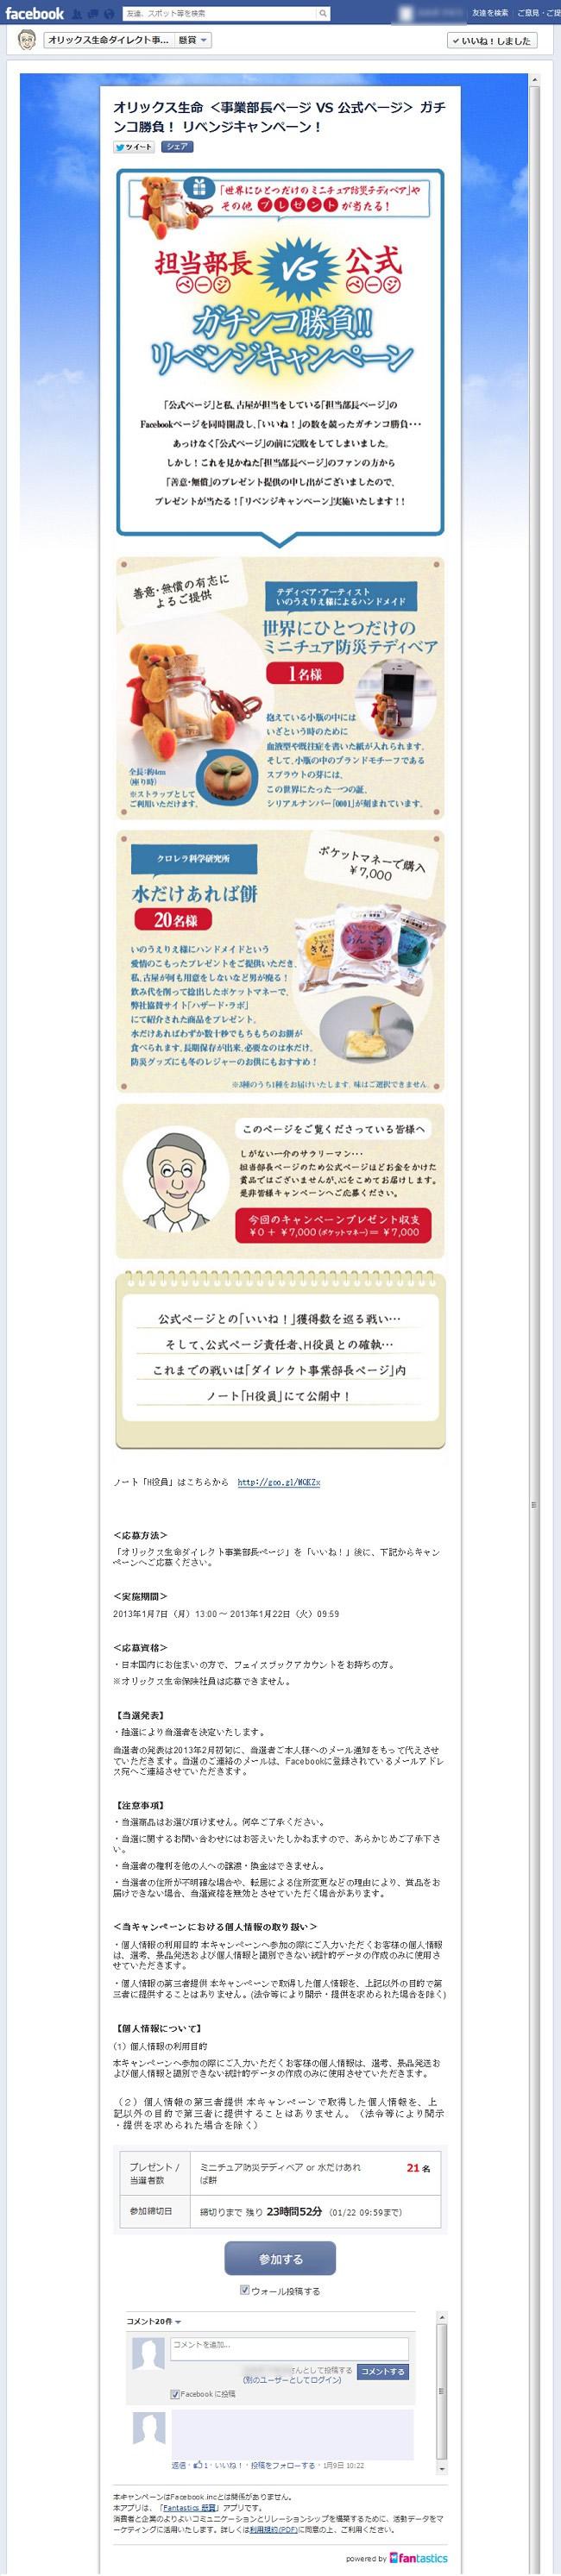 Fantastics 懸賞アプリ(オリックス生命ダイレクト事業部長様)